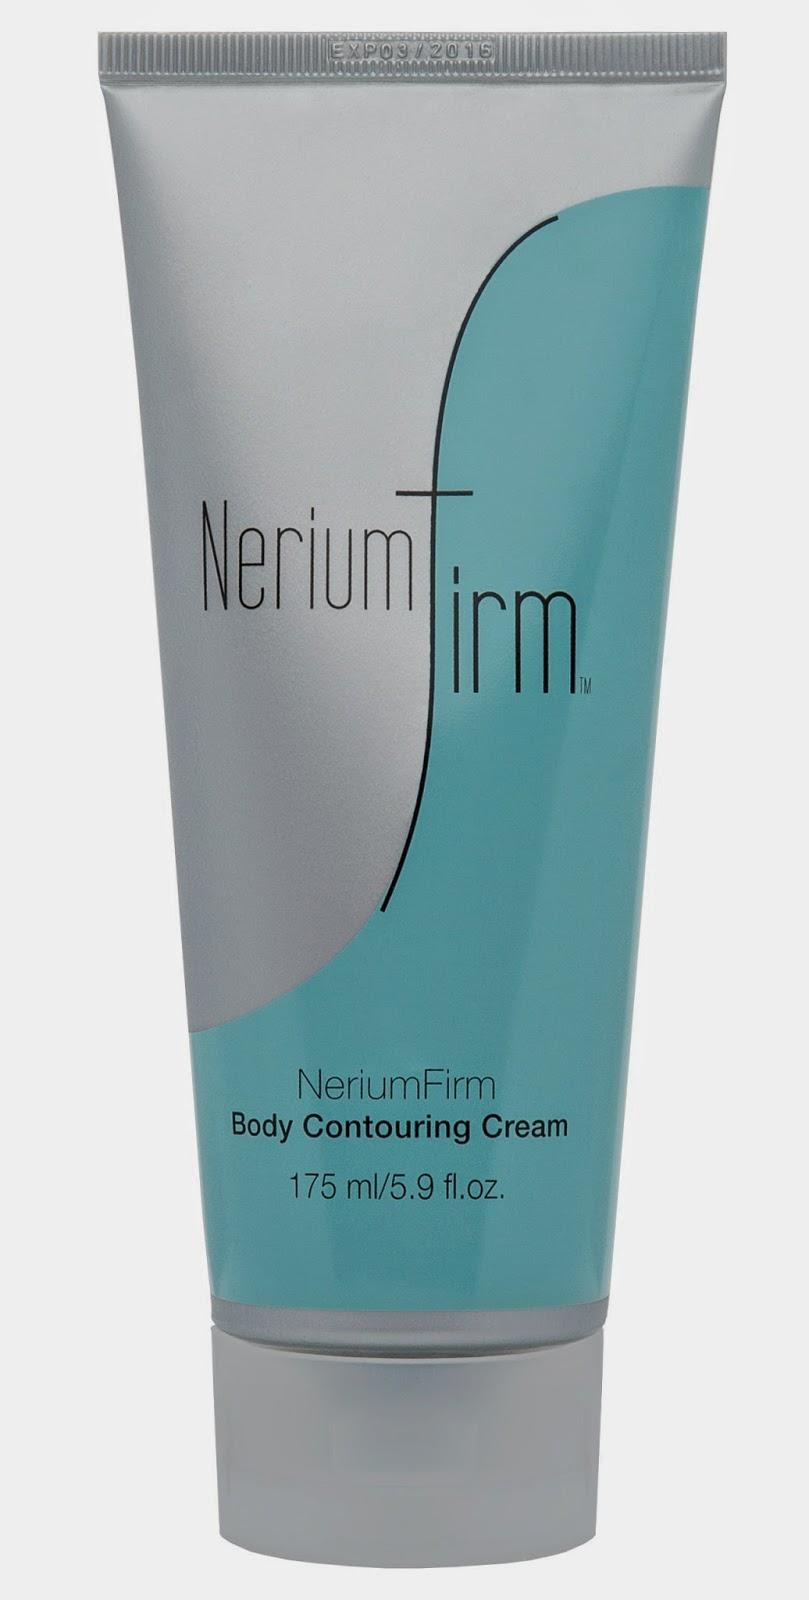 http://www.nerium.com/cmauro?ID=cmauro